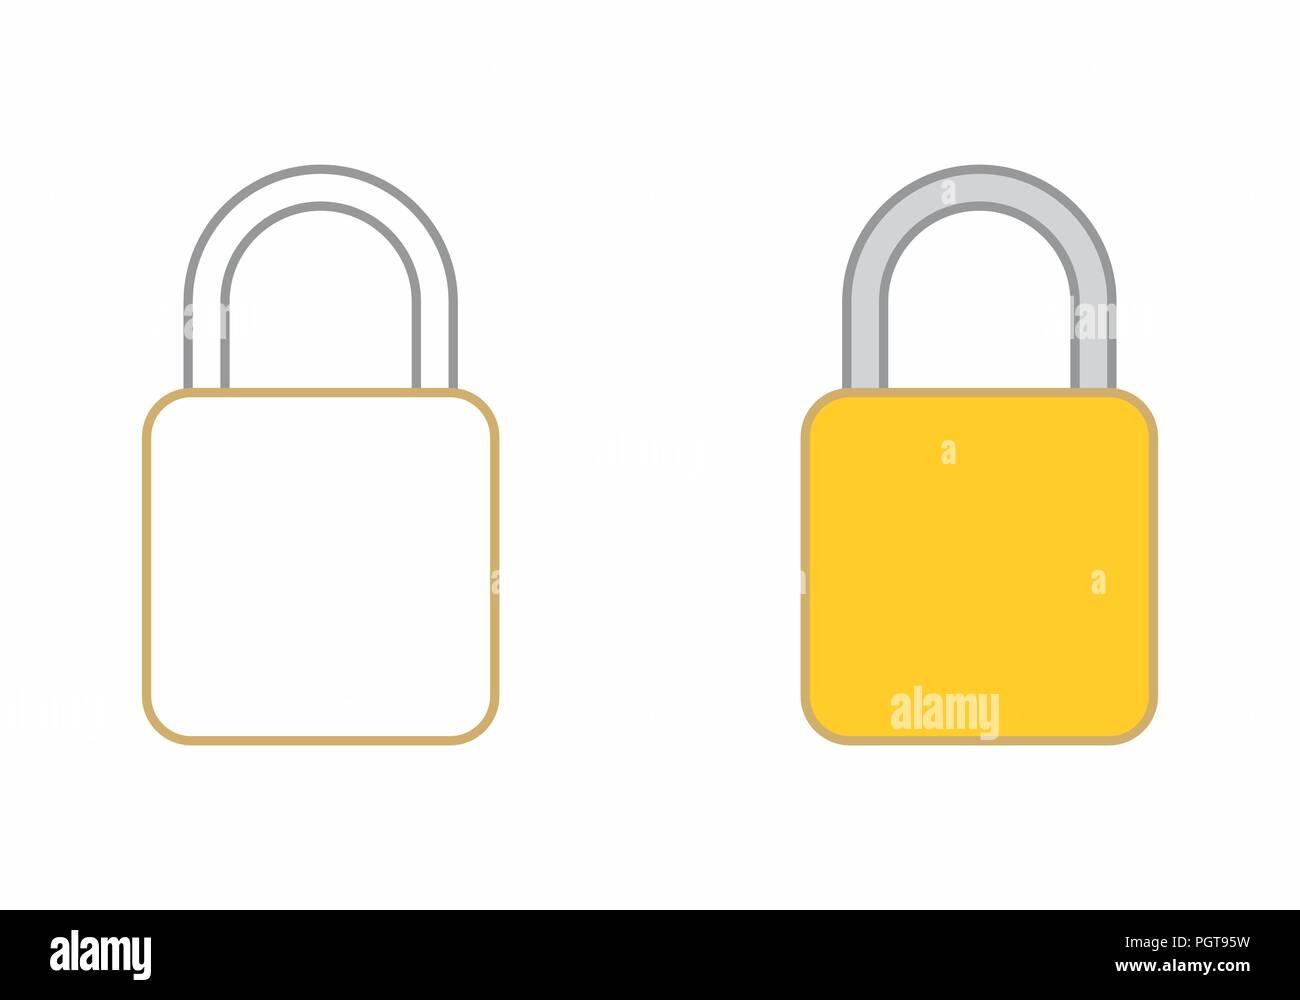 Flat illustrations of padlocks isolated on white background Stock Vector